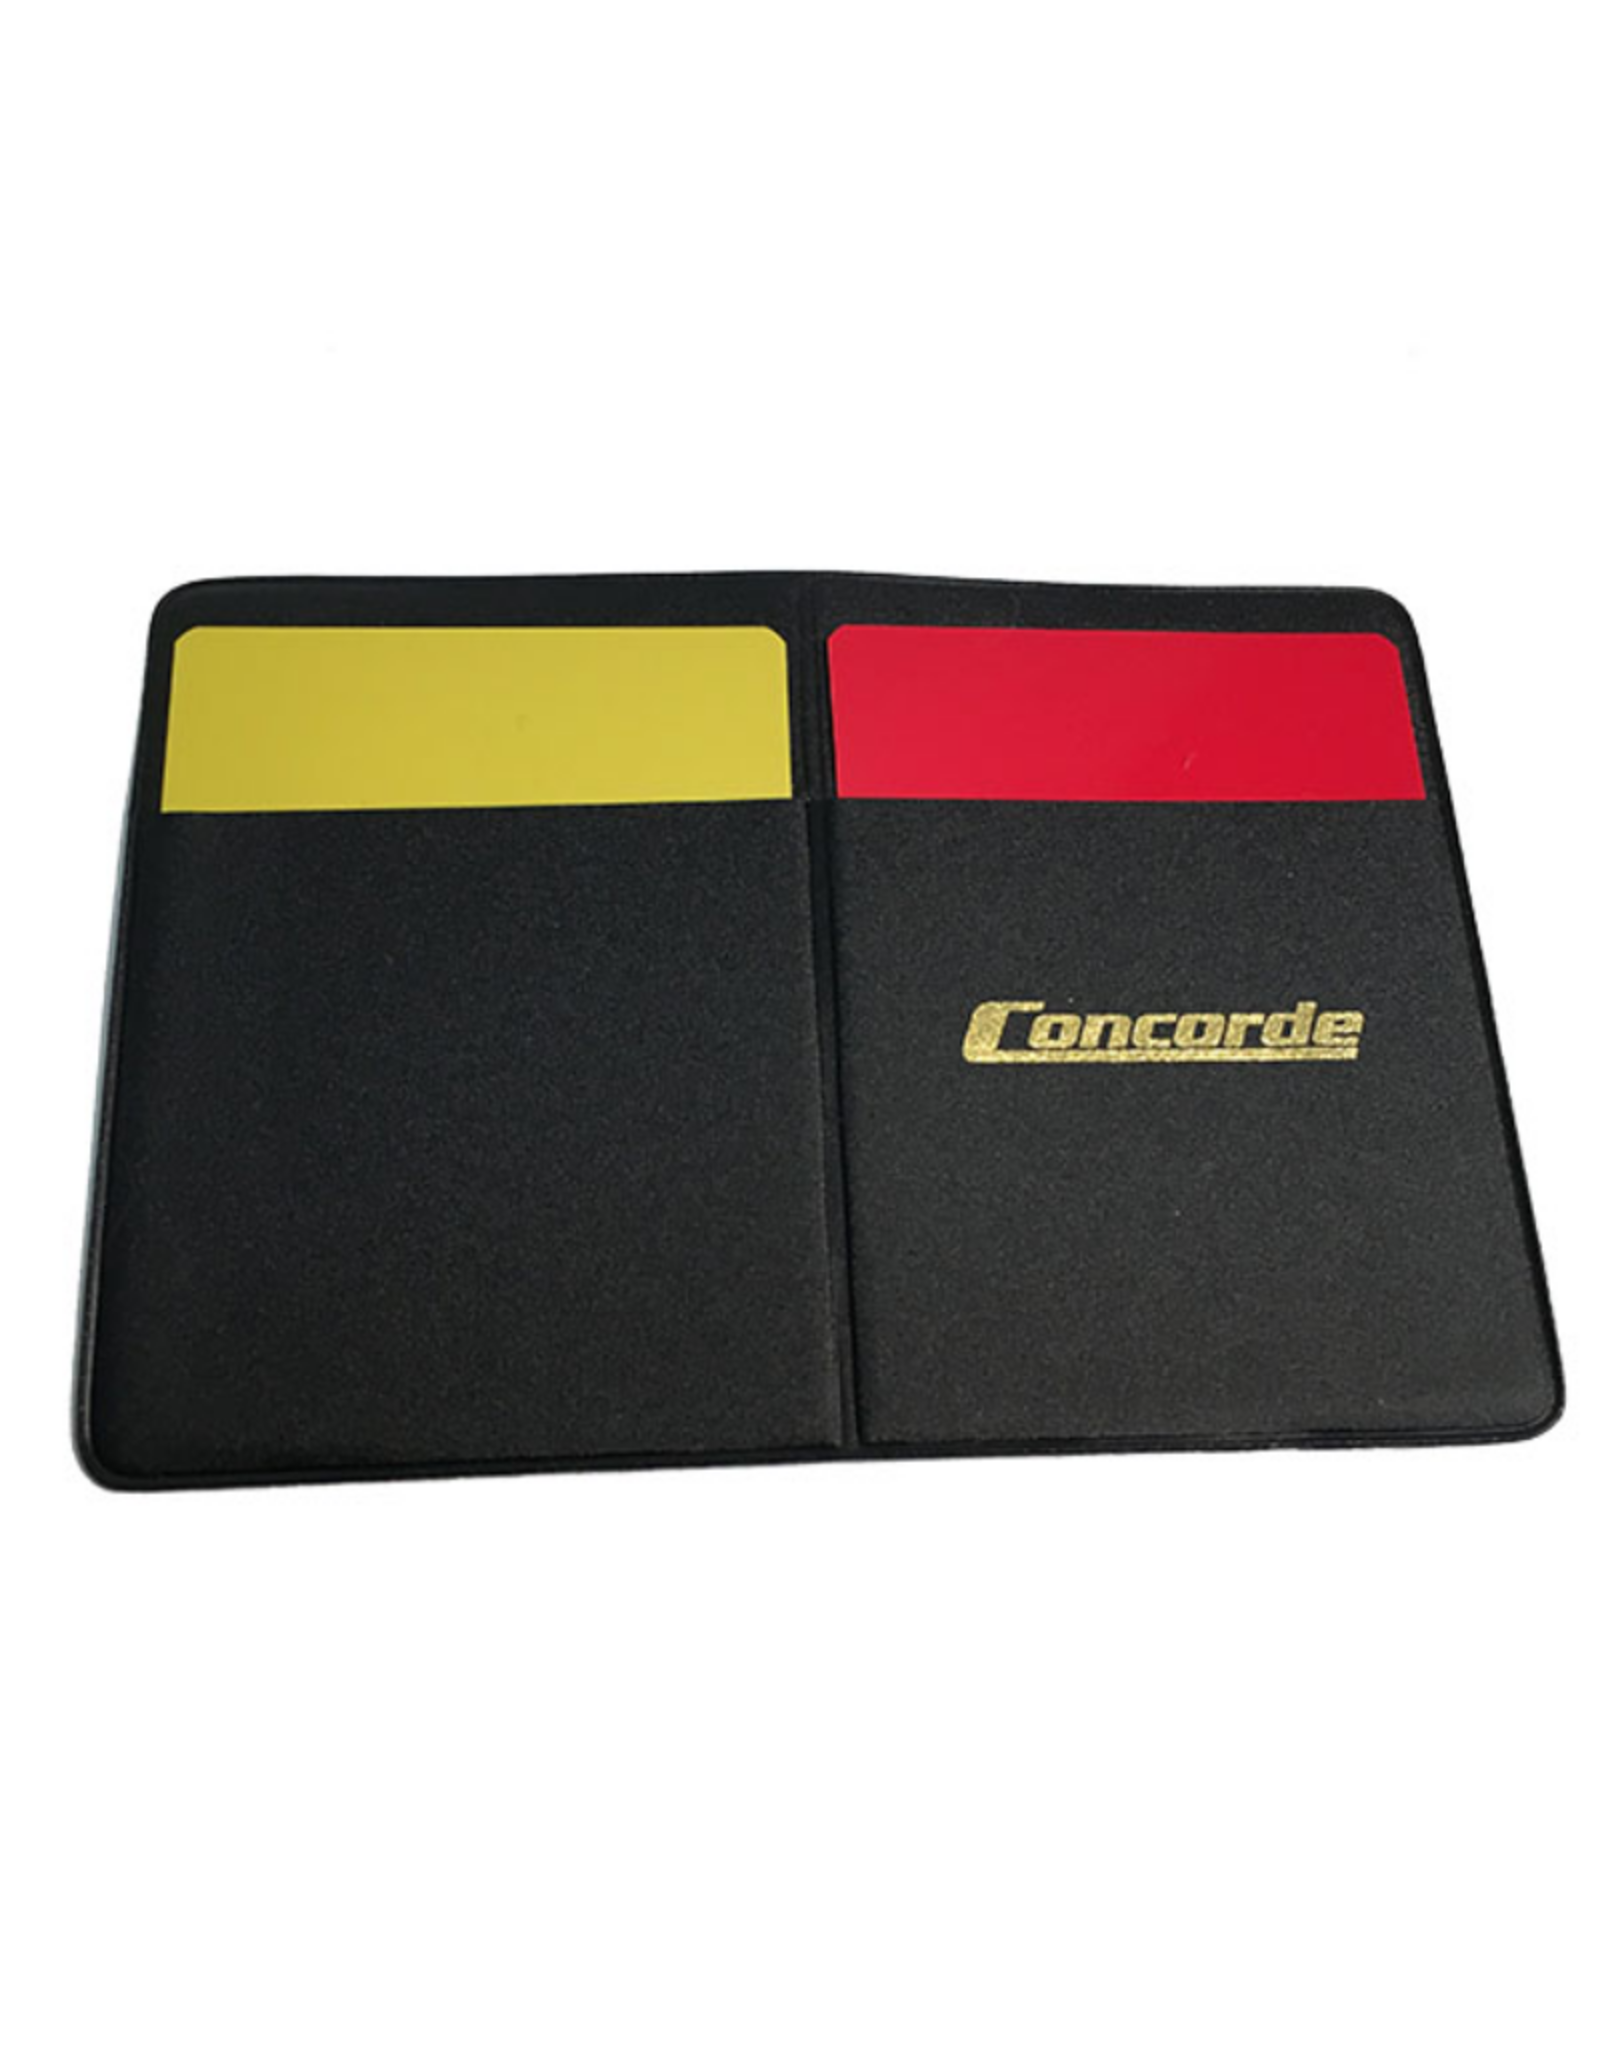 360 Athletic 360 Athletics Concorde Soccer Referee Card Set